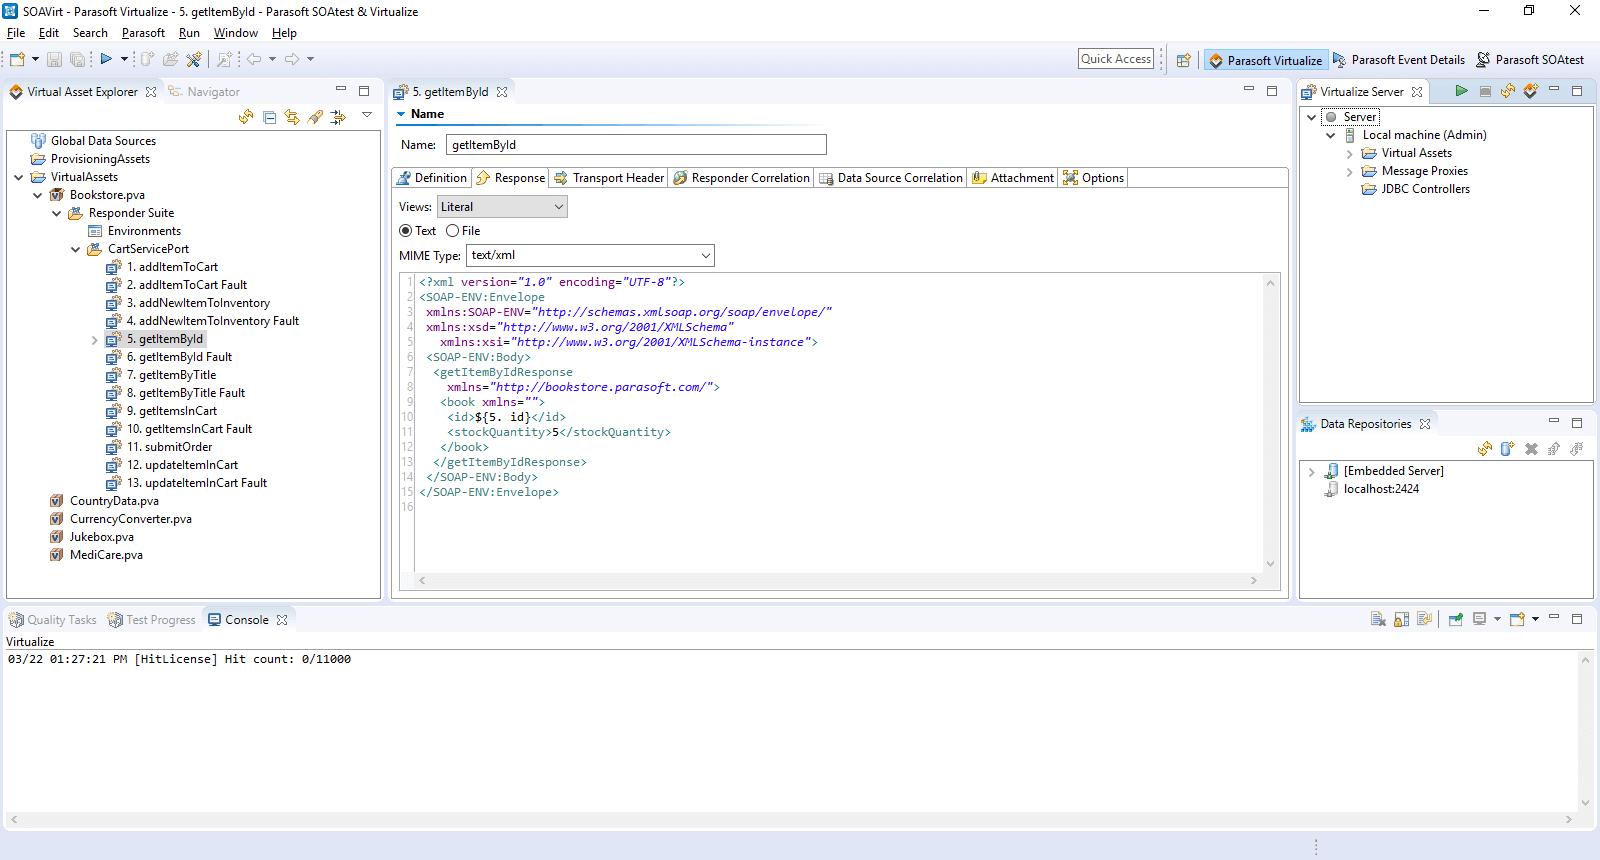 Parasoft Virtualize interface